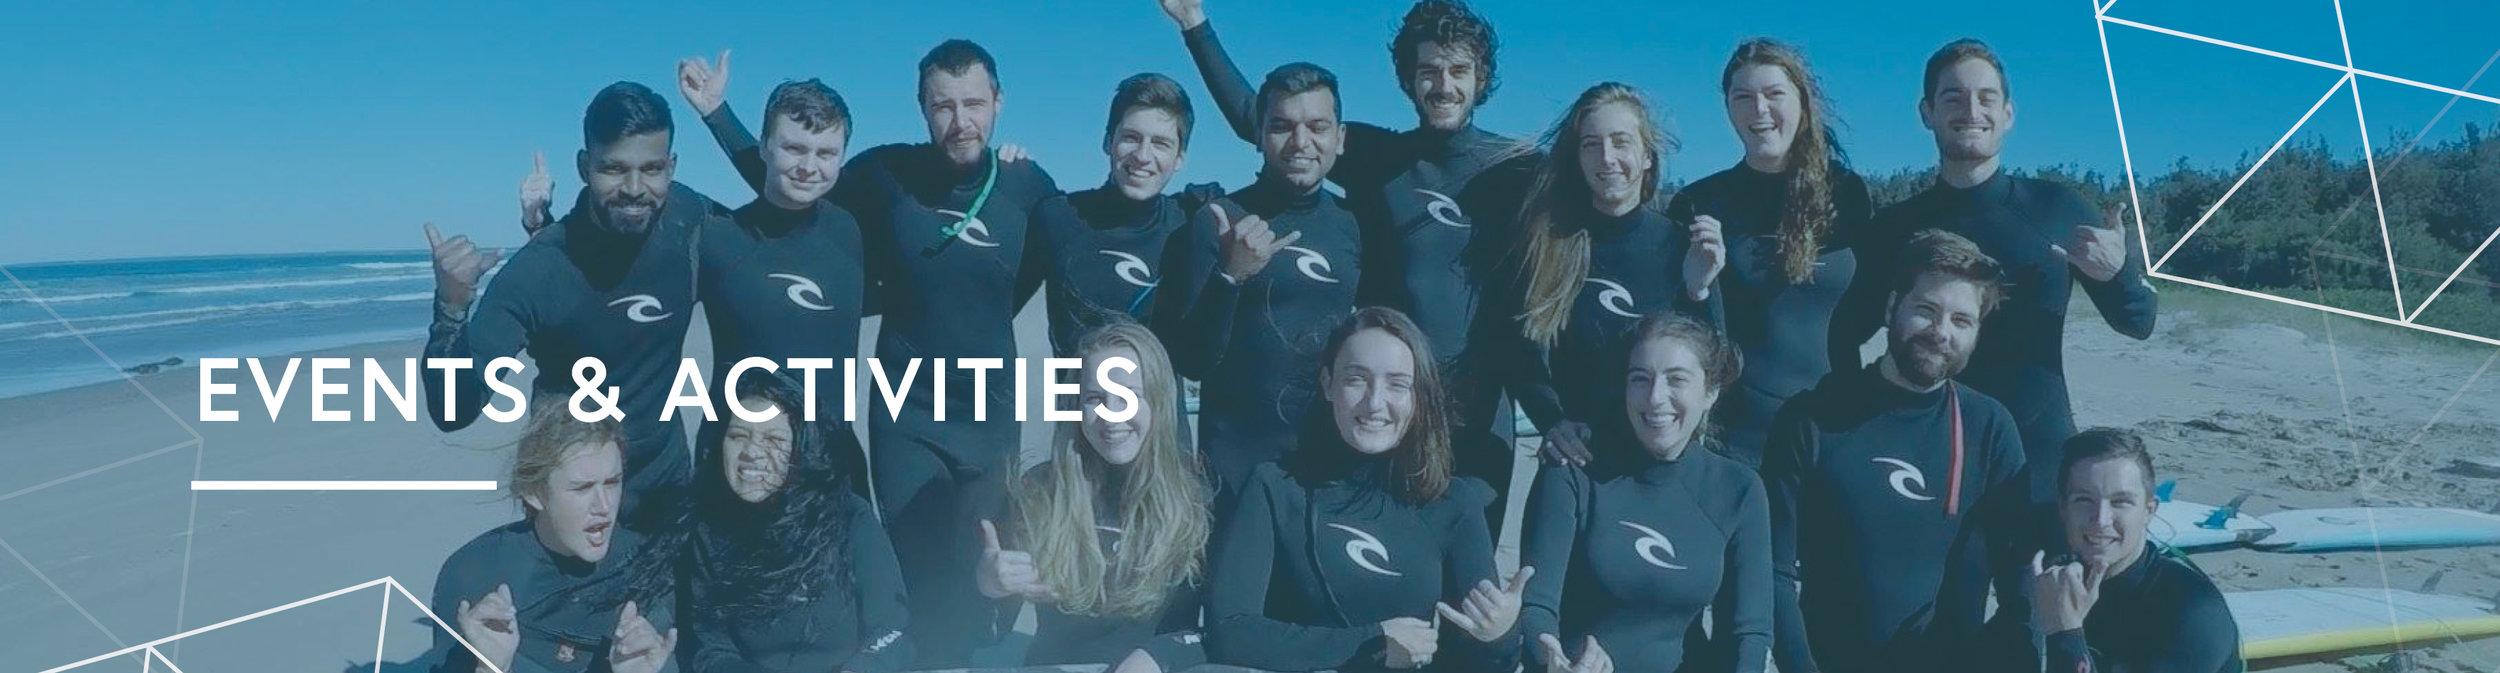 ACBI Events and Activities